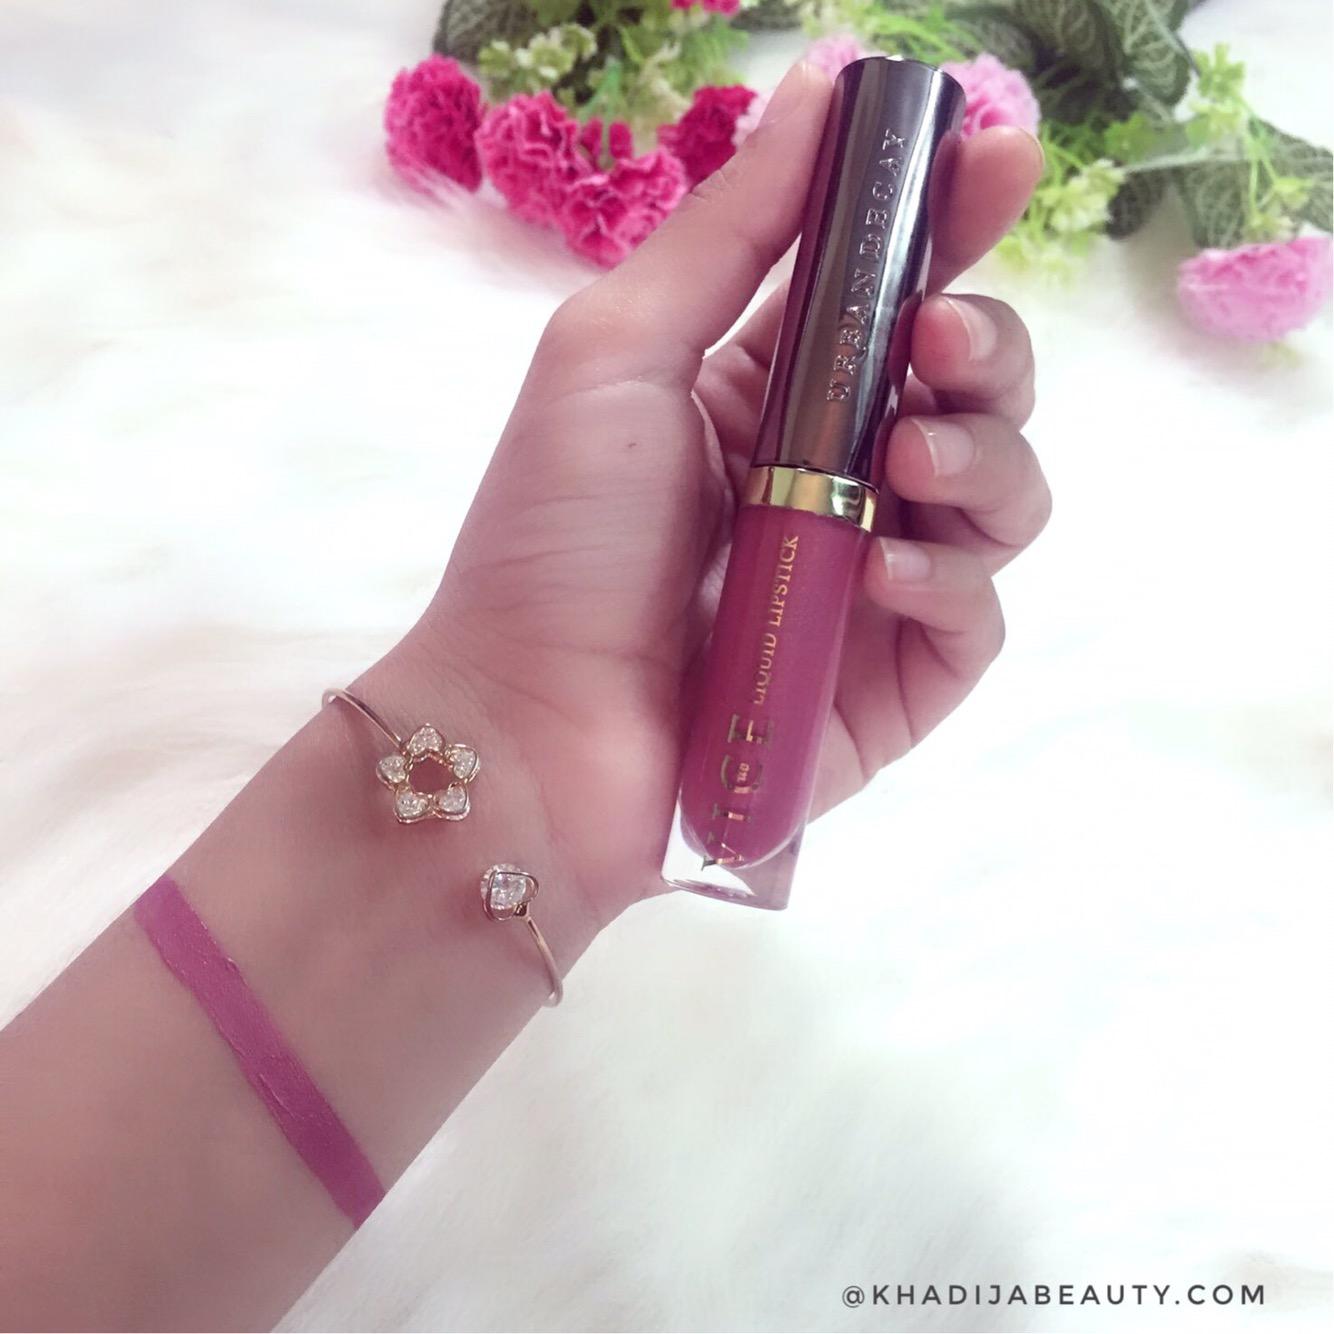 urban decay vice liquid lipstick trivial review & swatches, khadija beauty